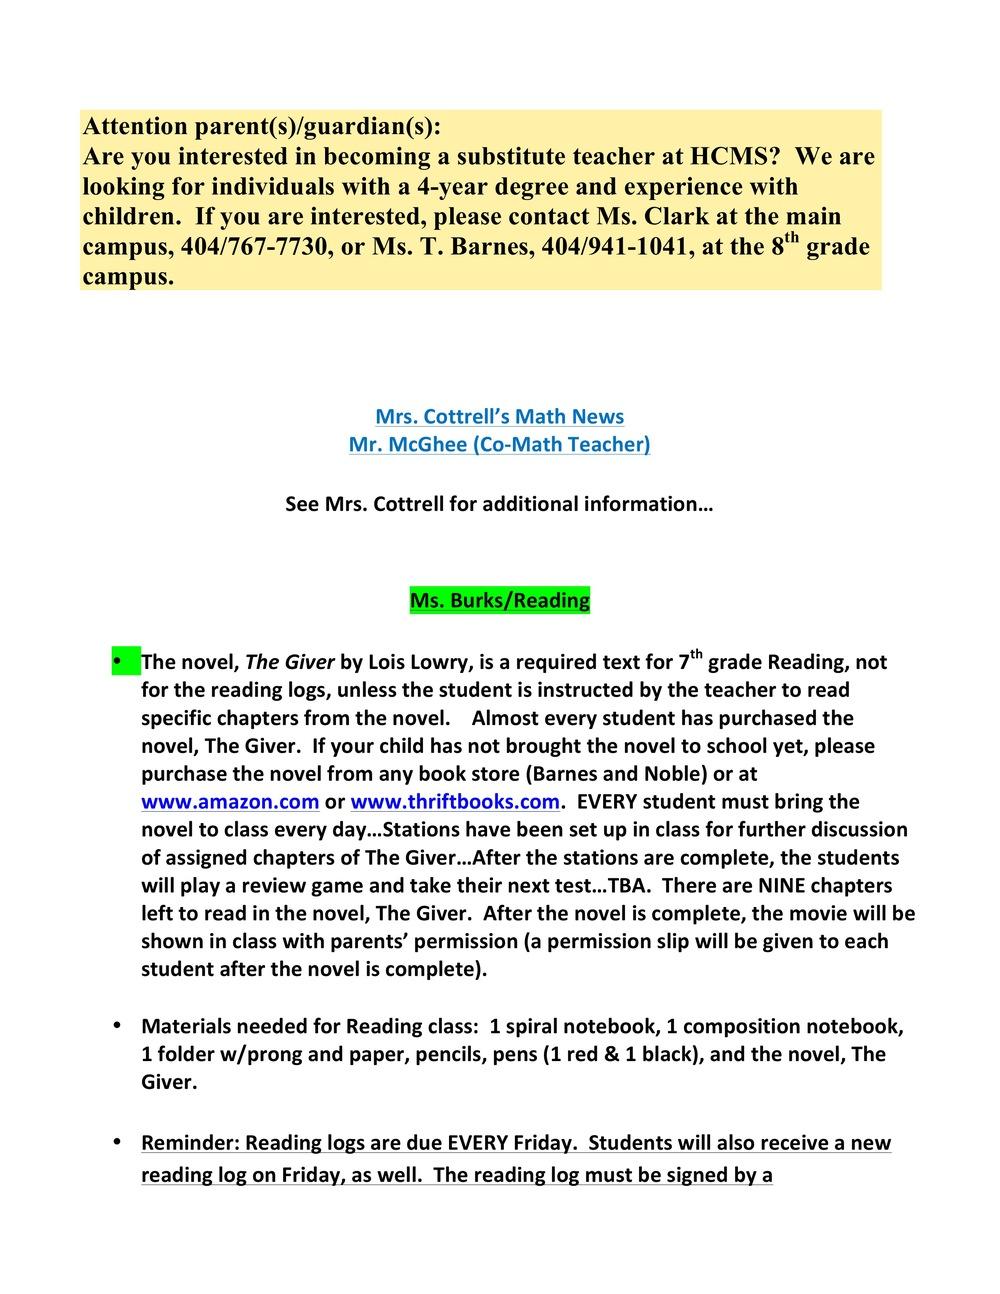 Newsletter Image7th grade January 26, 2015 2.jpeg